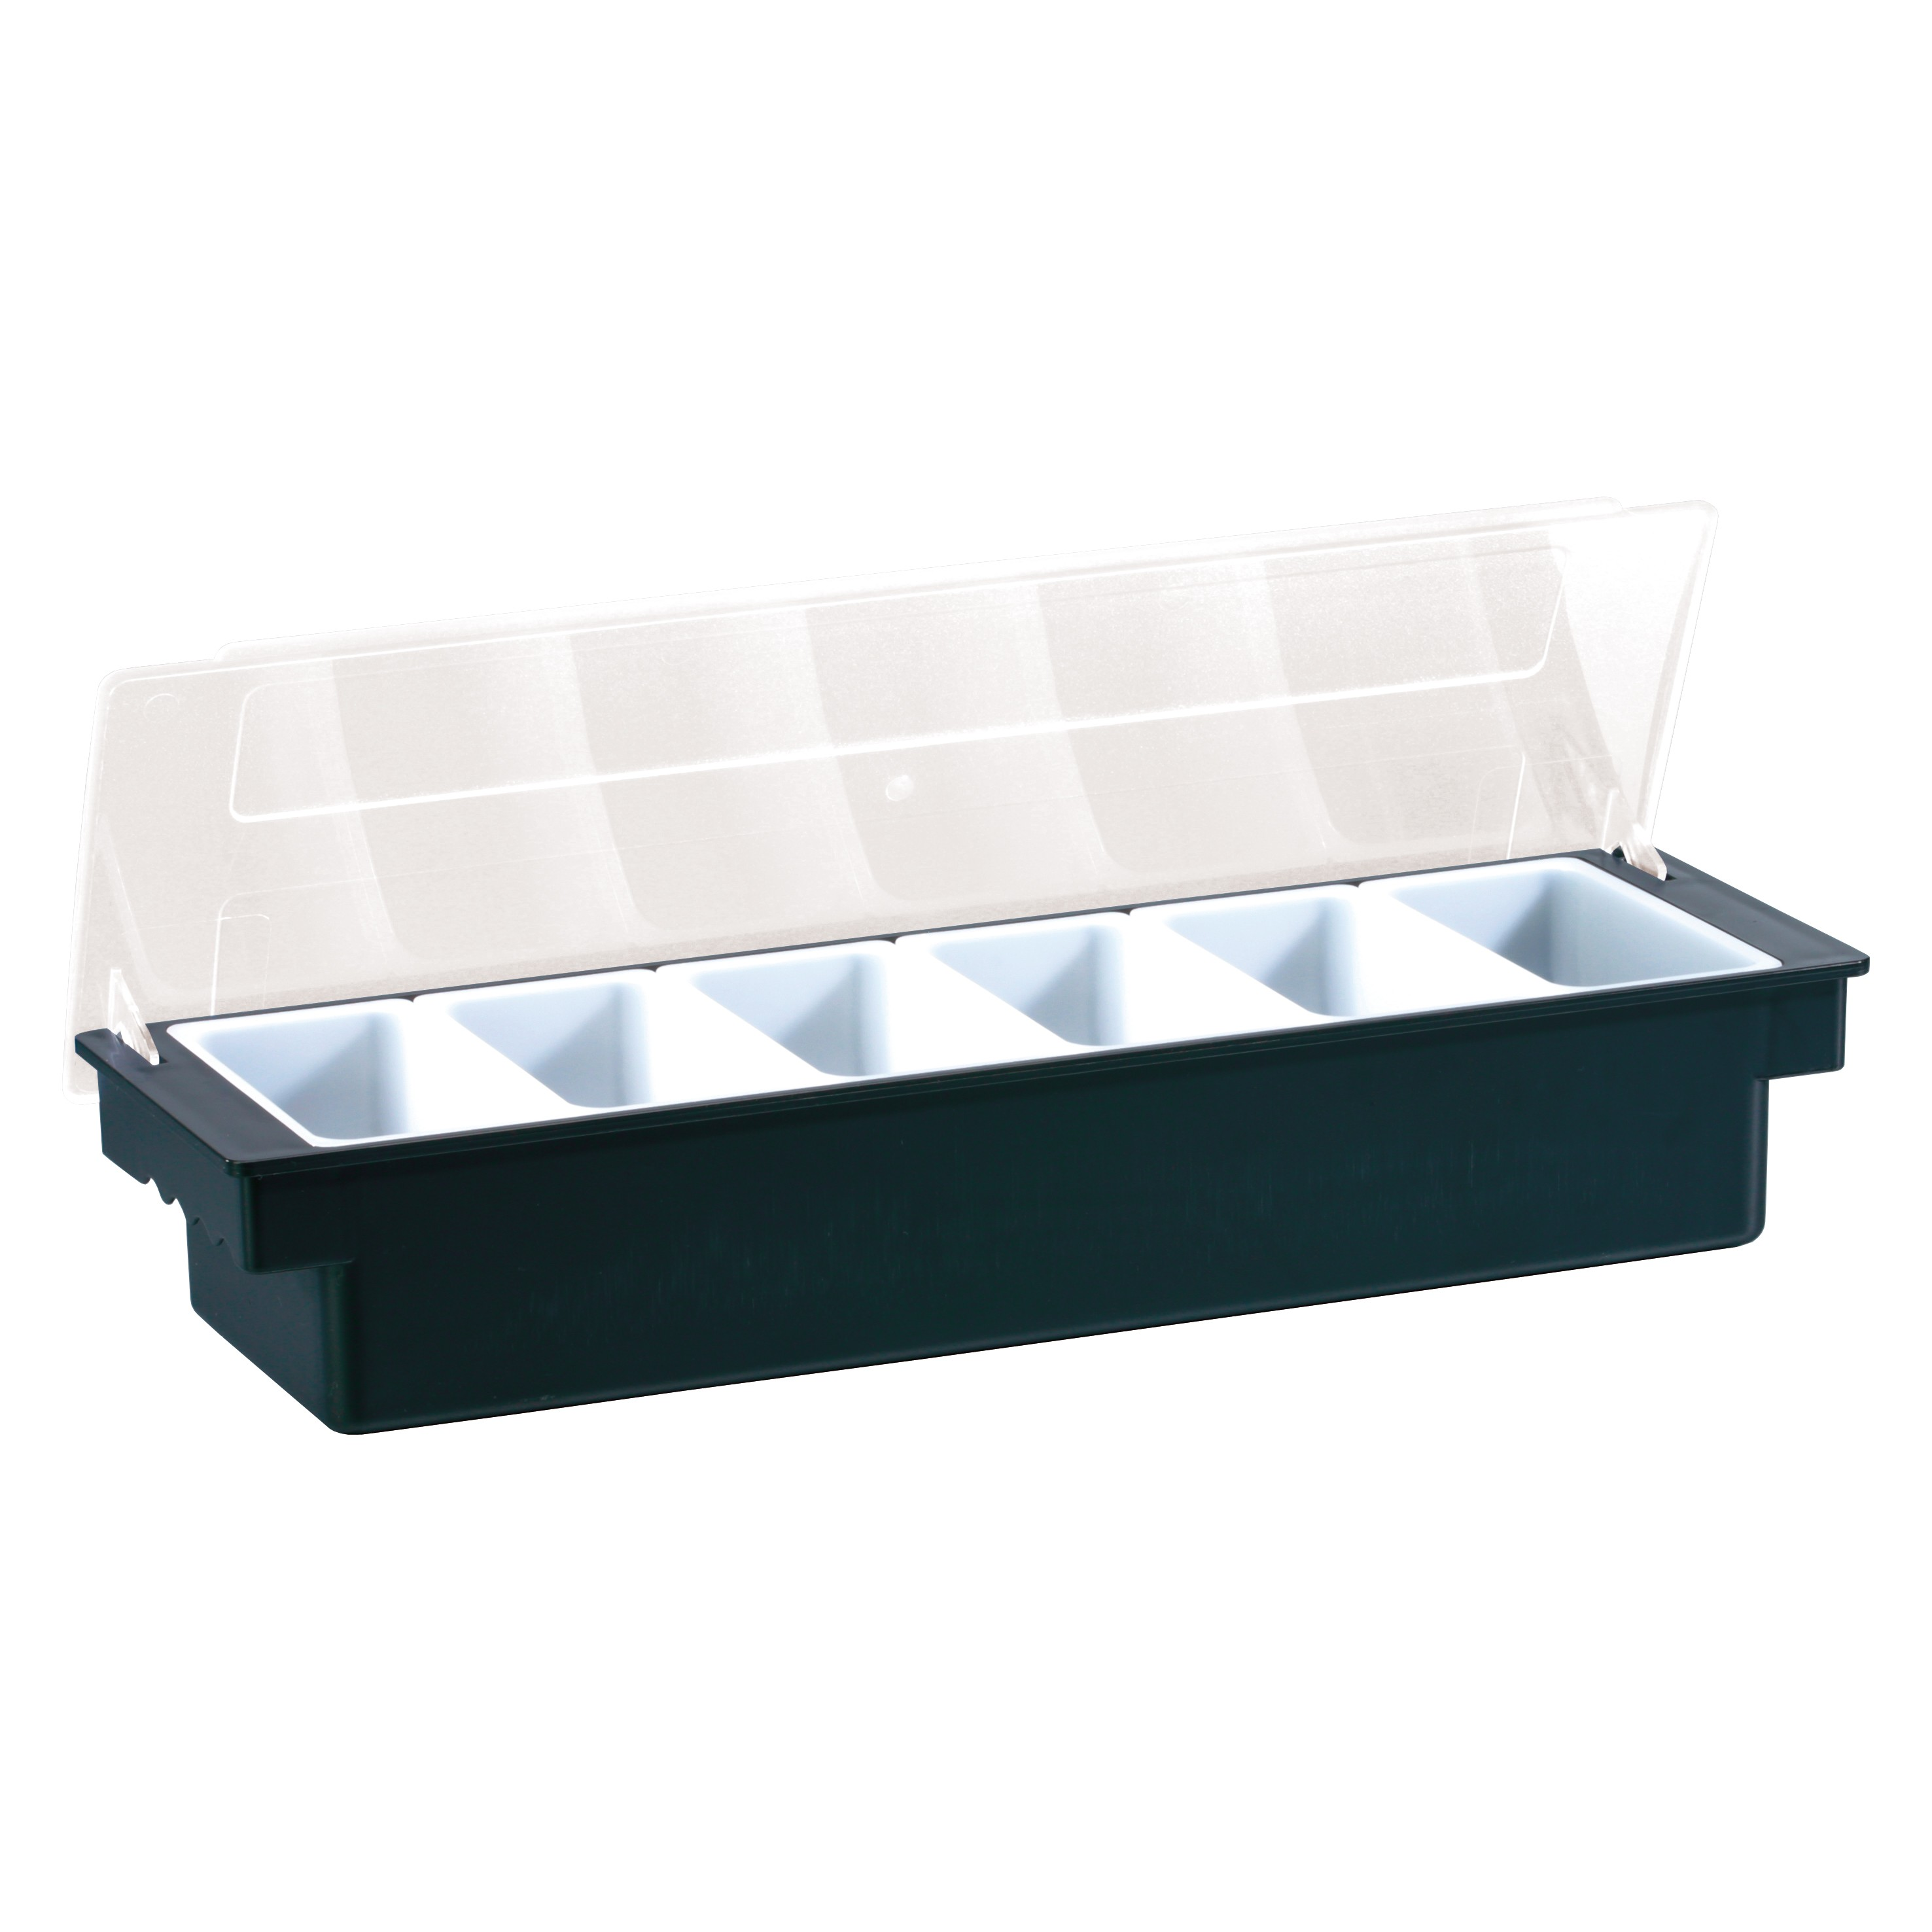 Condiment Dispenser 6 Compartments Black